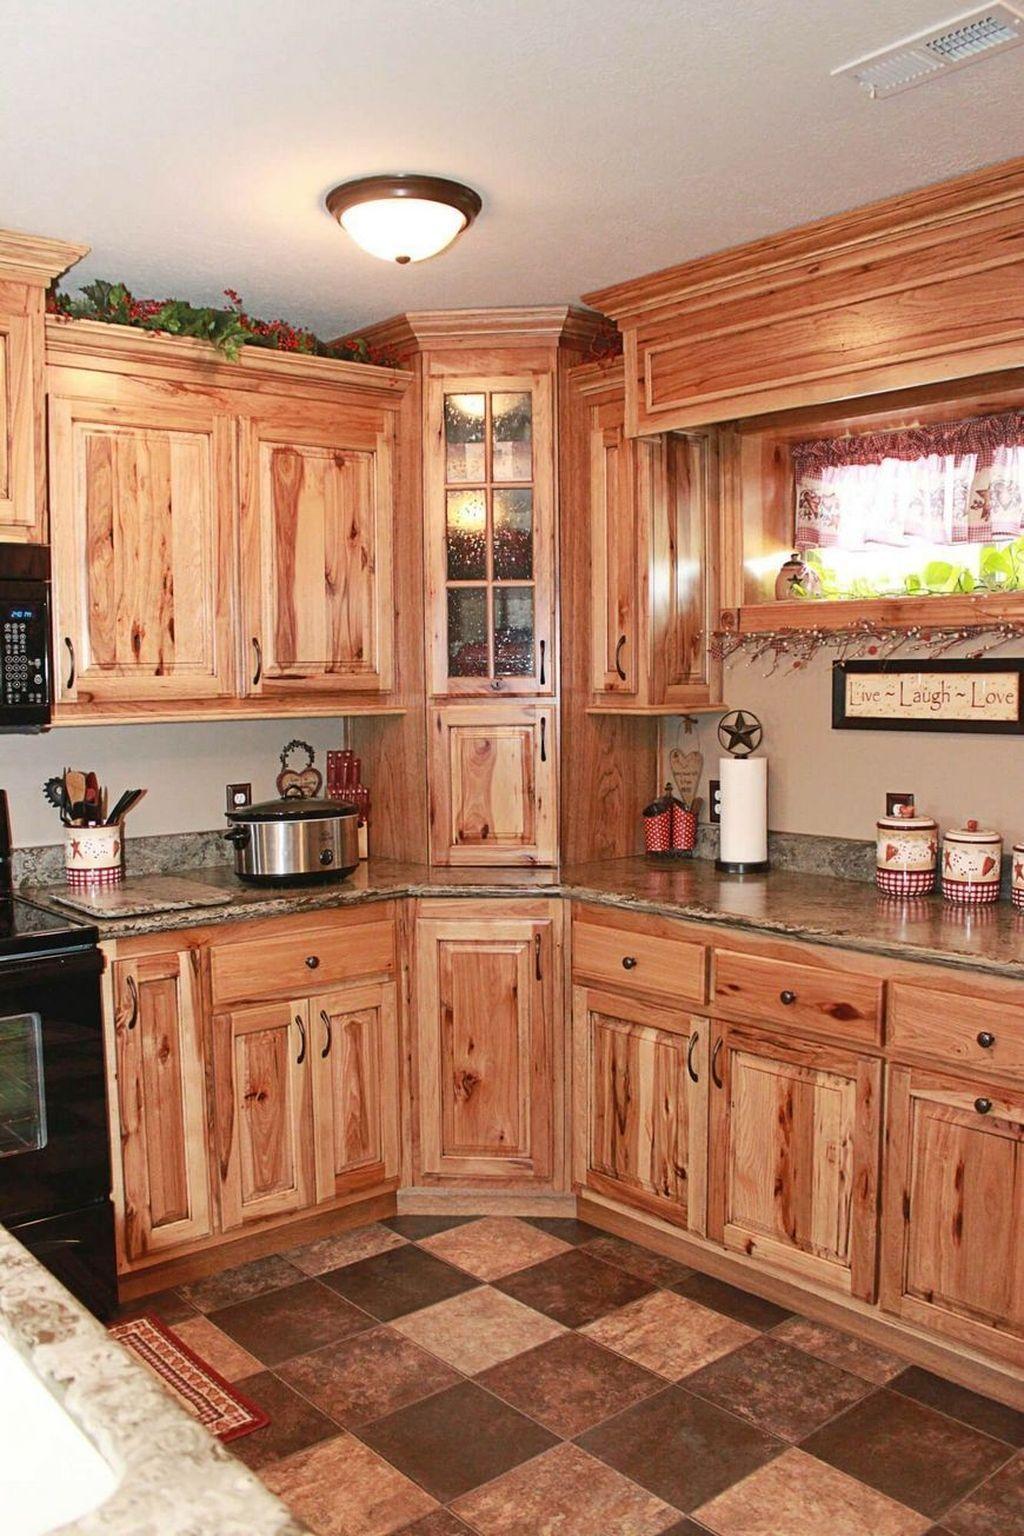 33 Nice Rustic Farmhouse Kitchen Cabinets Design Ideas In 2020 Farmhouse Style Kitchen Cabinets Hickory Kitchen Cabinets Farmhouse Style Kitchen